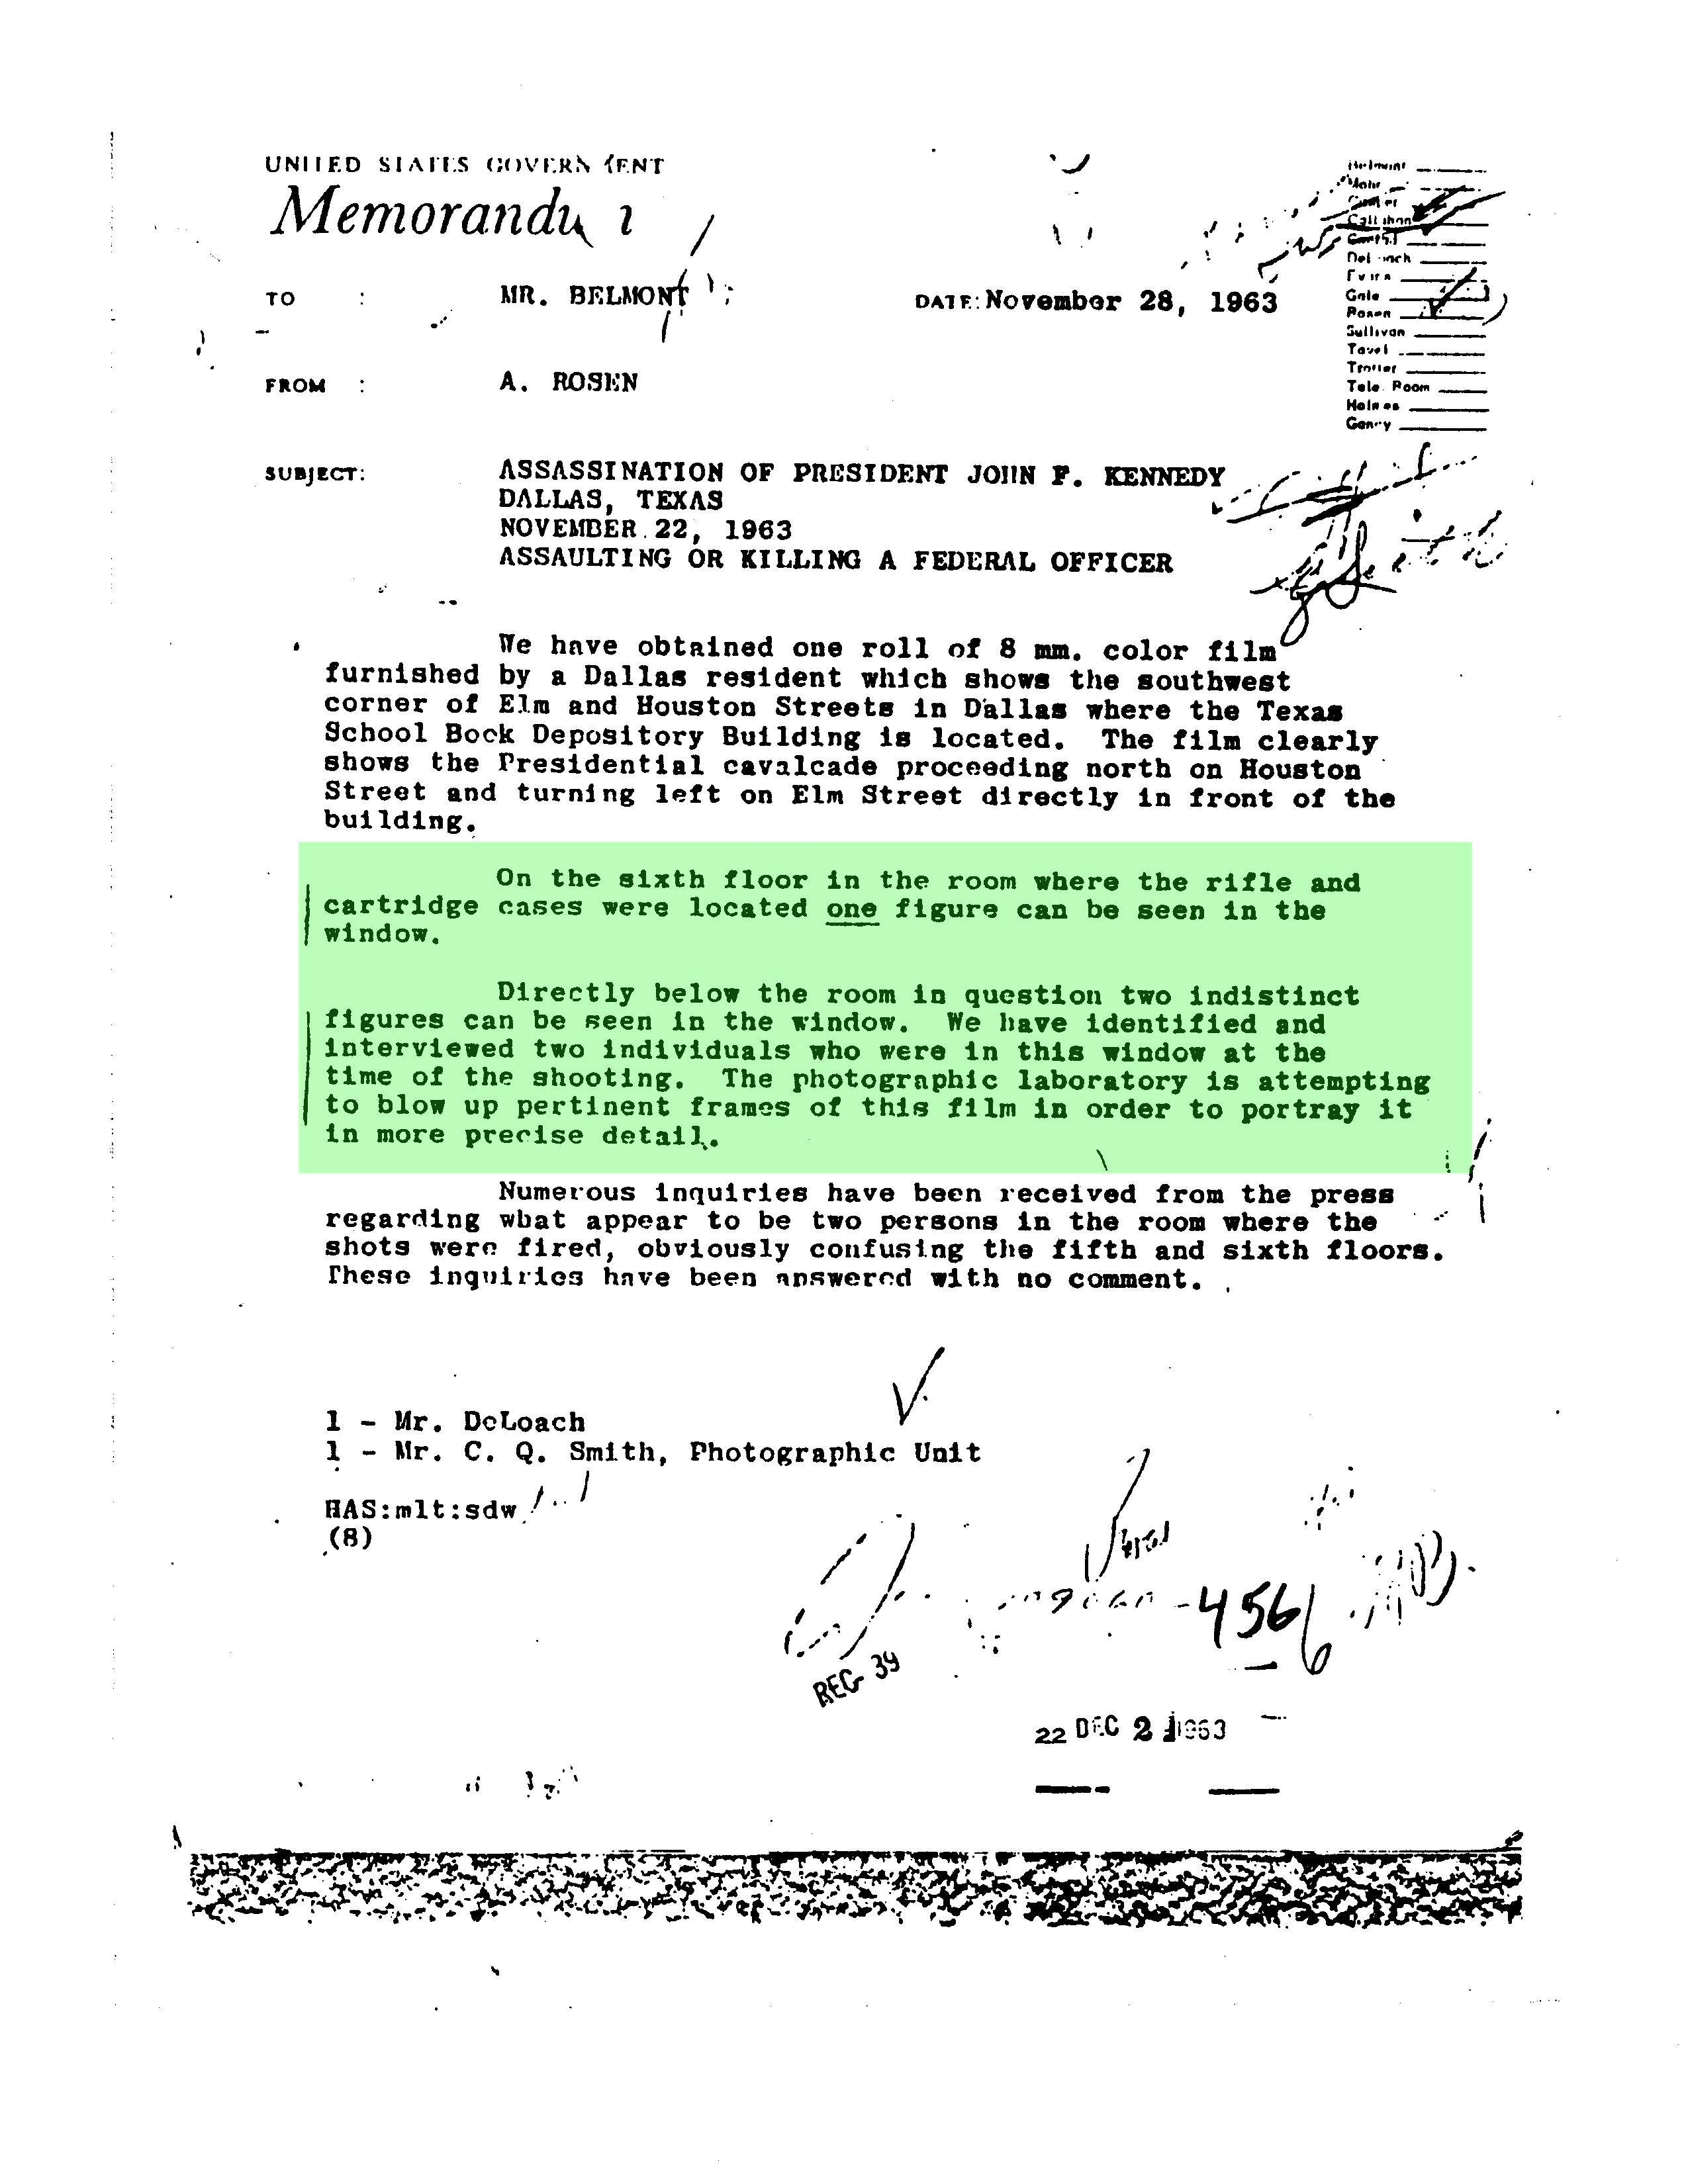 FBI Memo Rosen to Belmont Nov 28th 1963